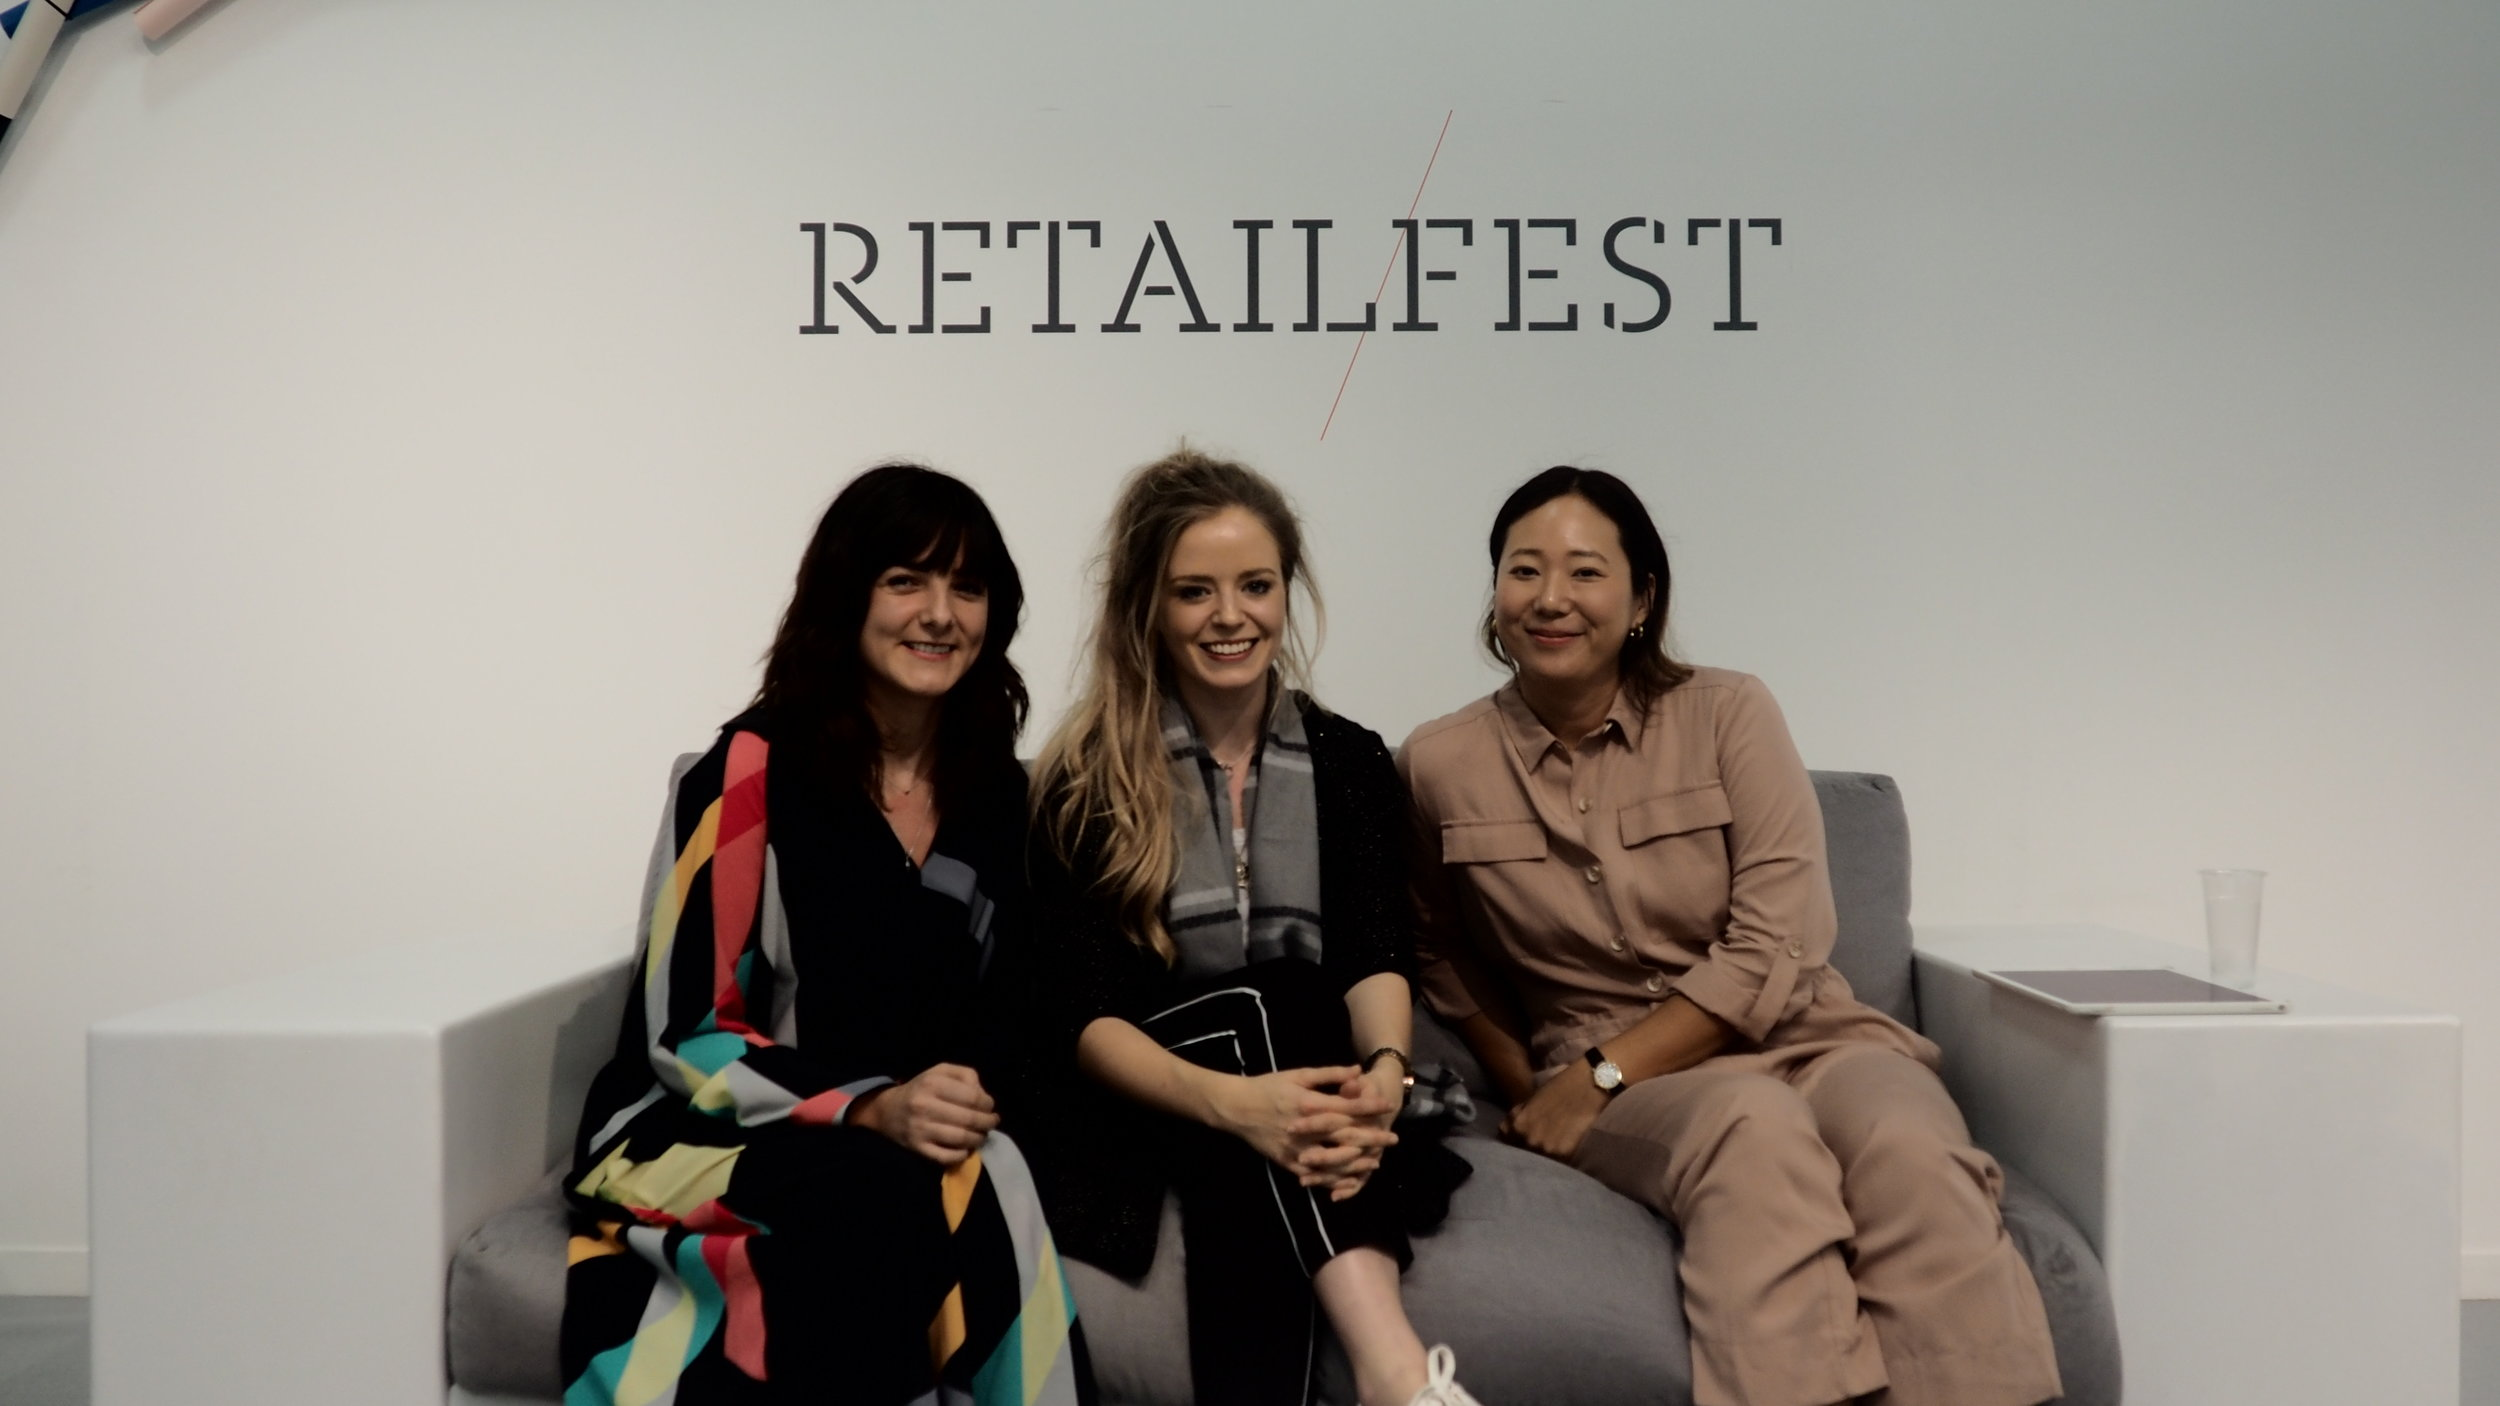 (L-R) Rosie Davies-Smith, Fiona Grayson and Molly Parks.